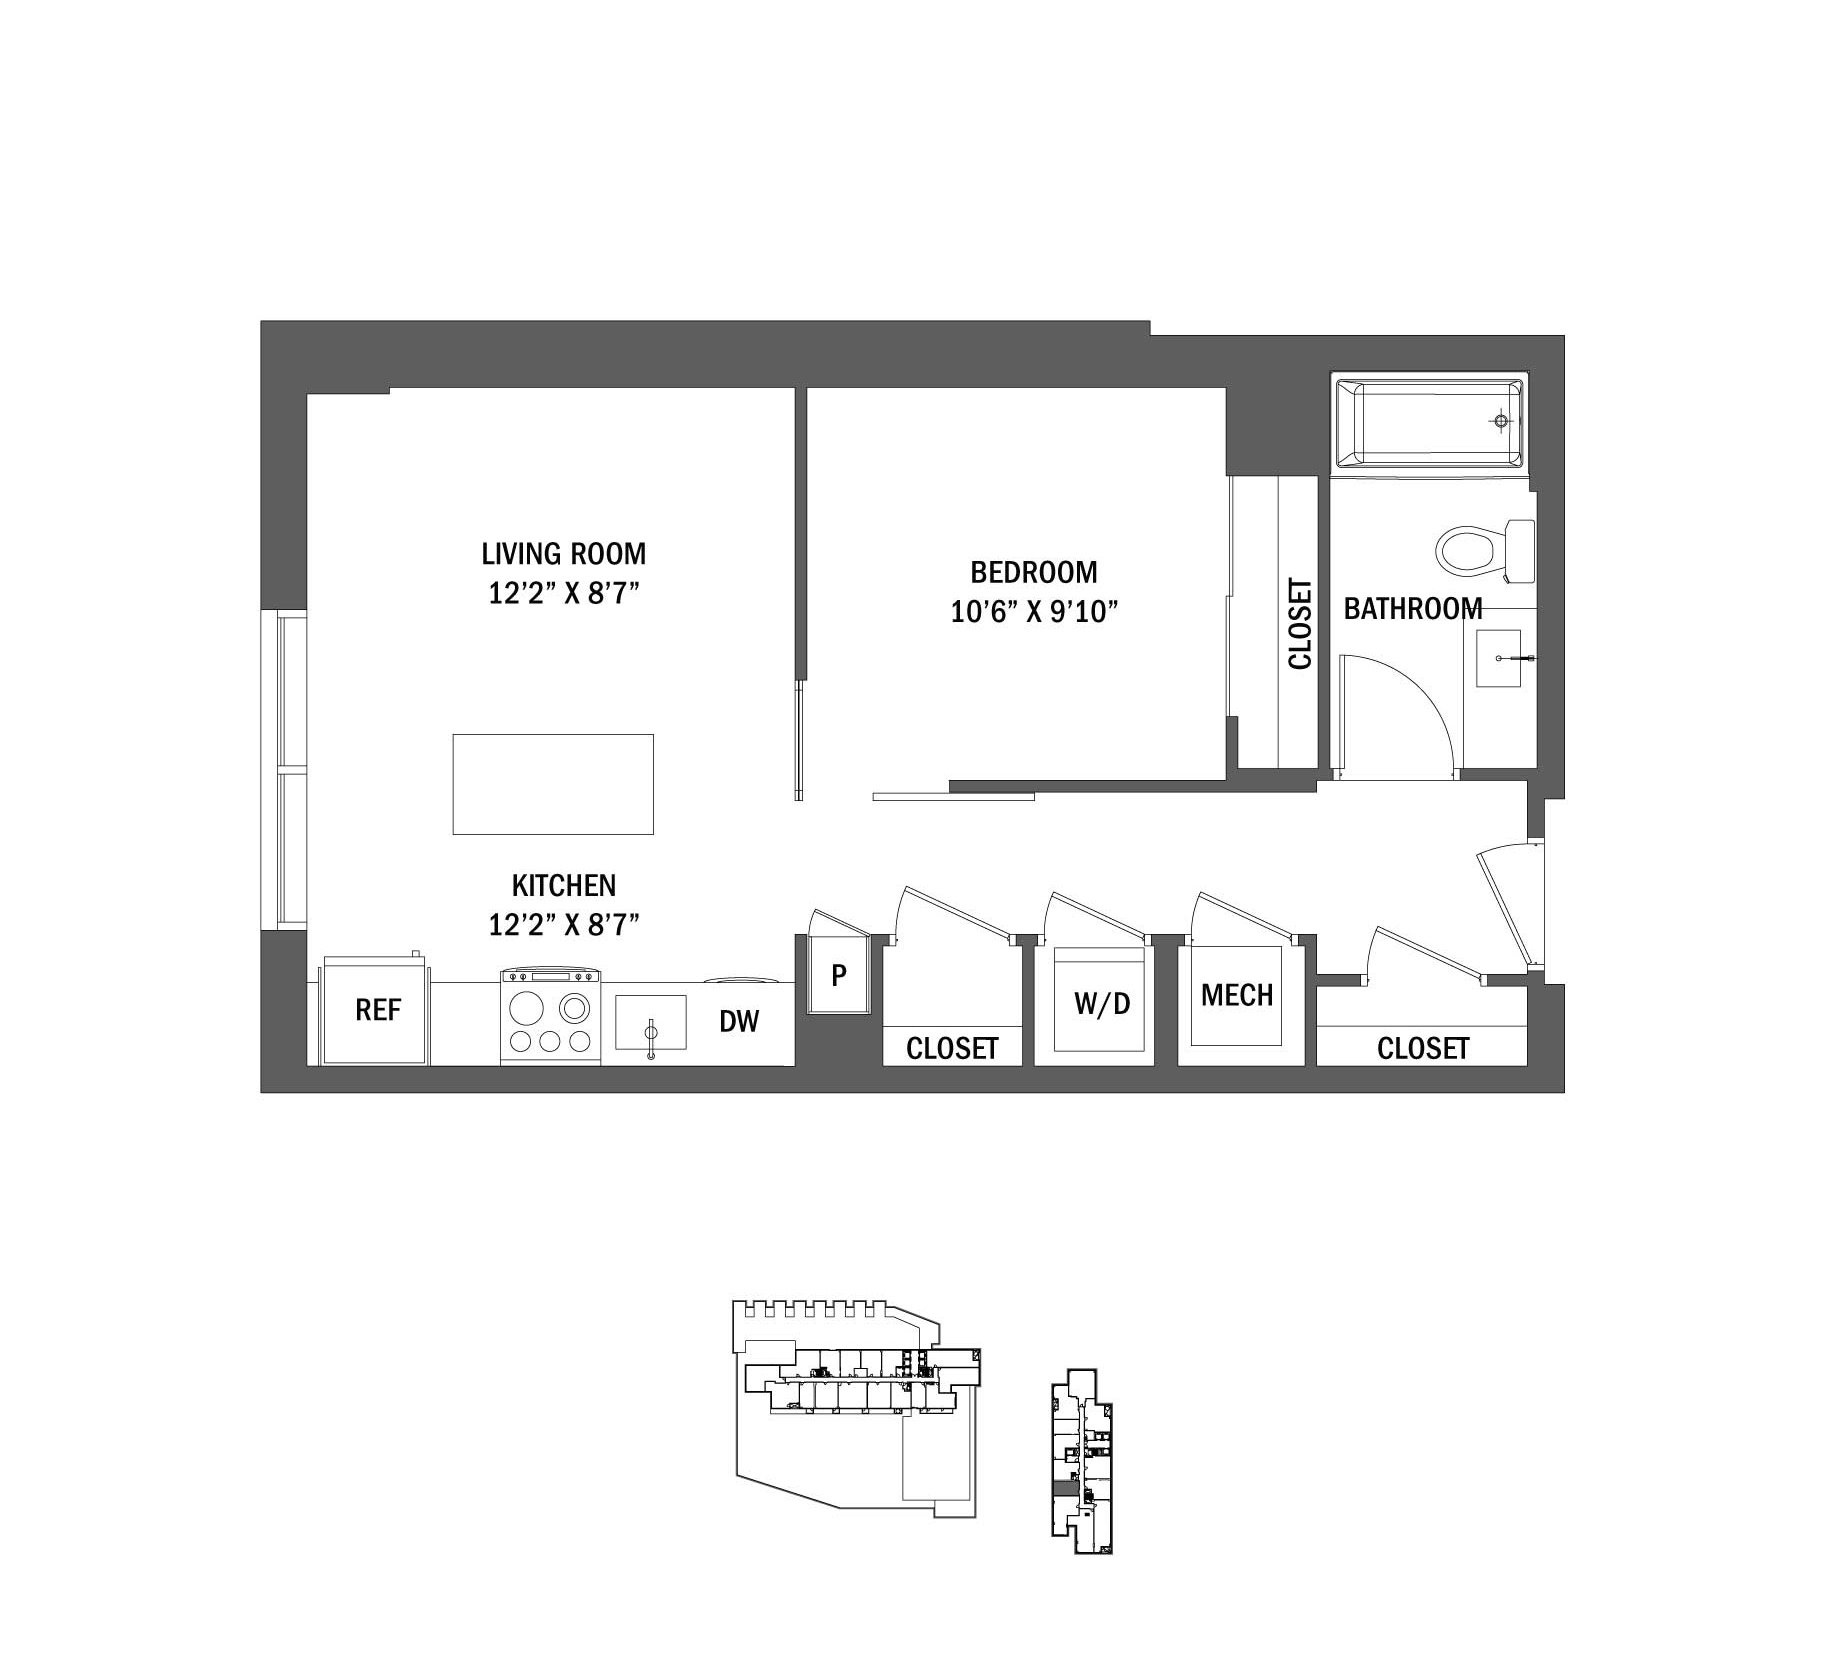 Studio, 1, 2, & 3 Bedroom Apartments